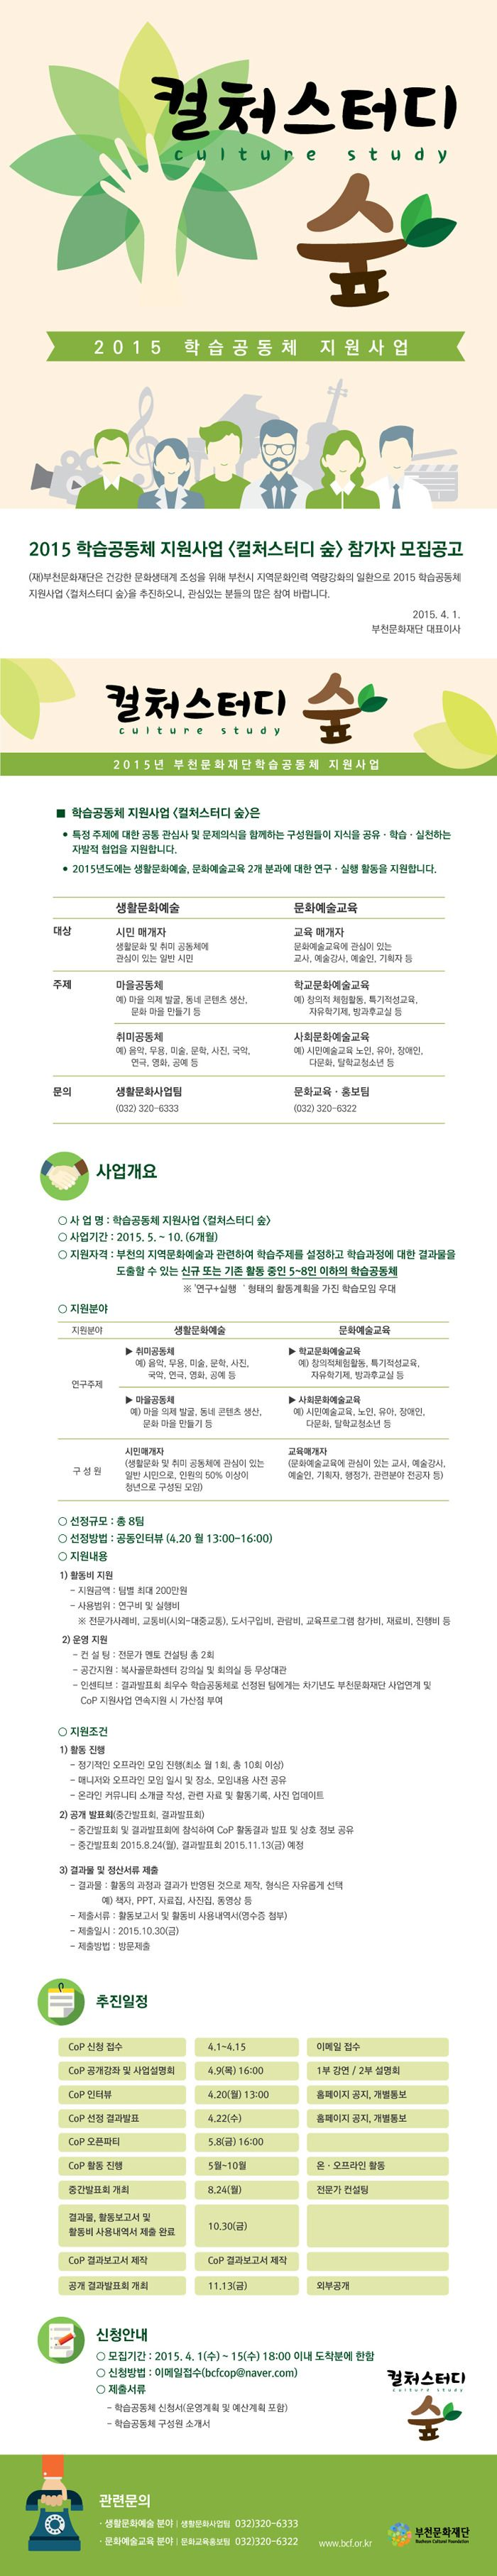 www.likedesign.co.kr :: '현수막'의 검색결과